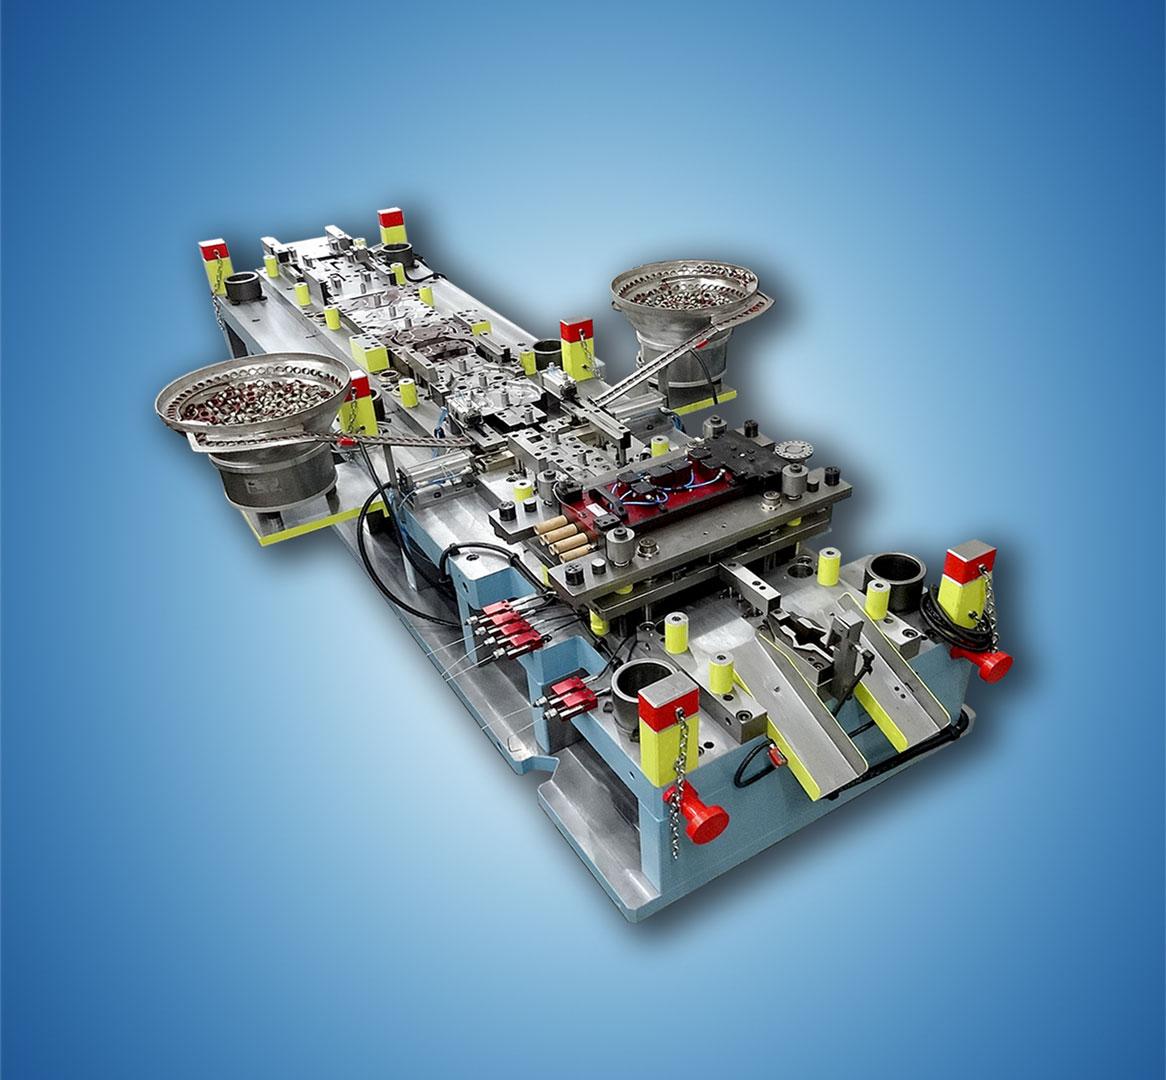 Ero-Projekt-d.o.o.-Toolshop-Werkzeugbau-3-Orodje-za-preoblikov--plocevine-_-slika-2